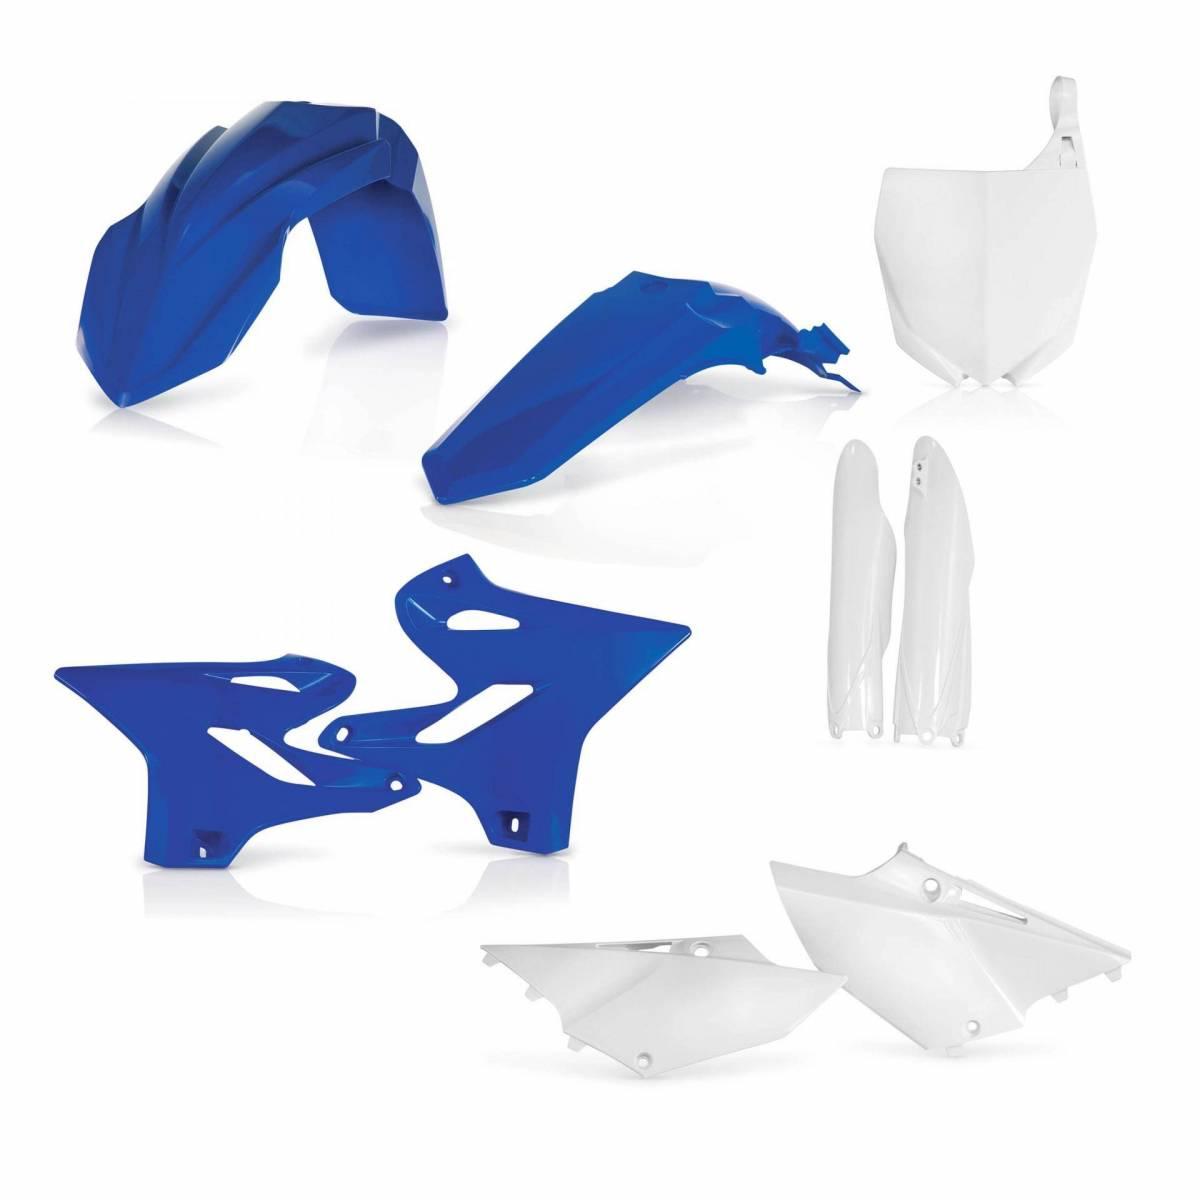 0017875-553 - Full Kit Plasticos Yz 125 Yz 250 15 17 Origen